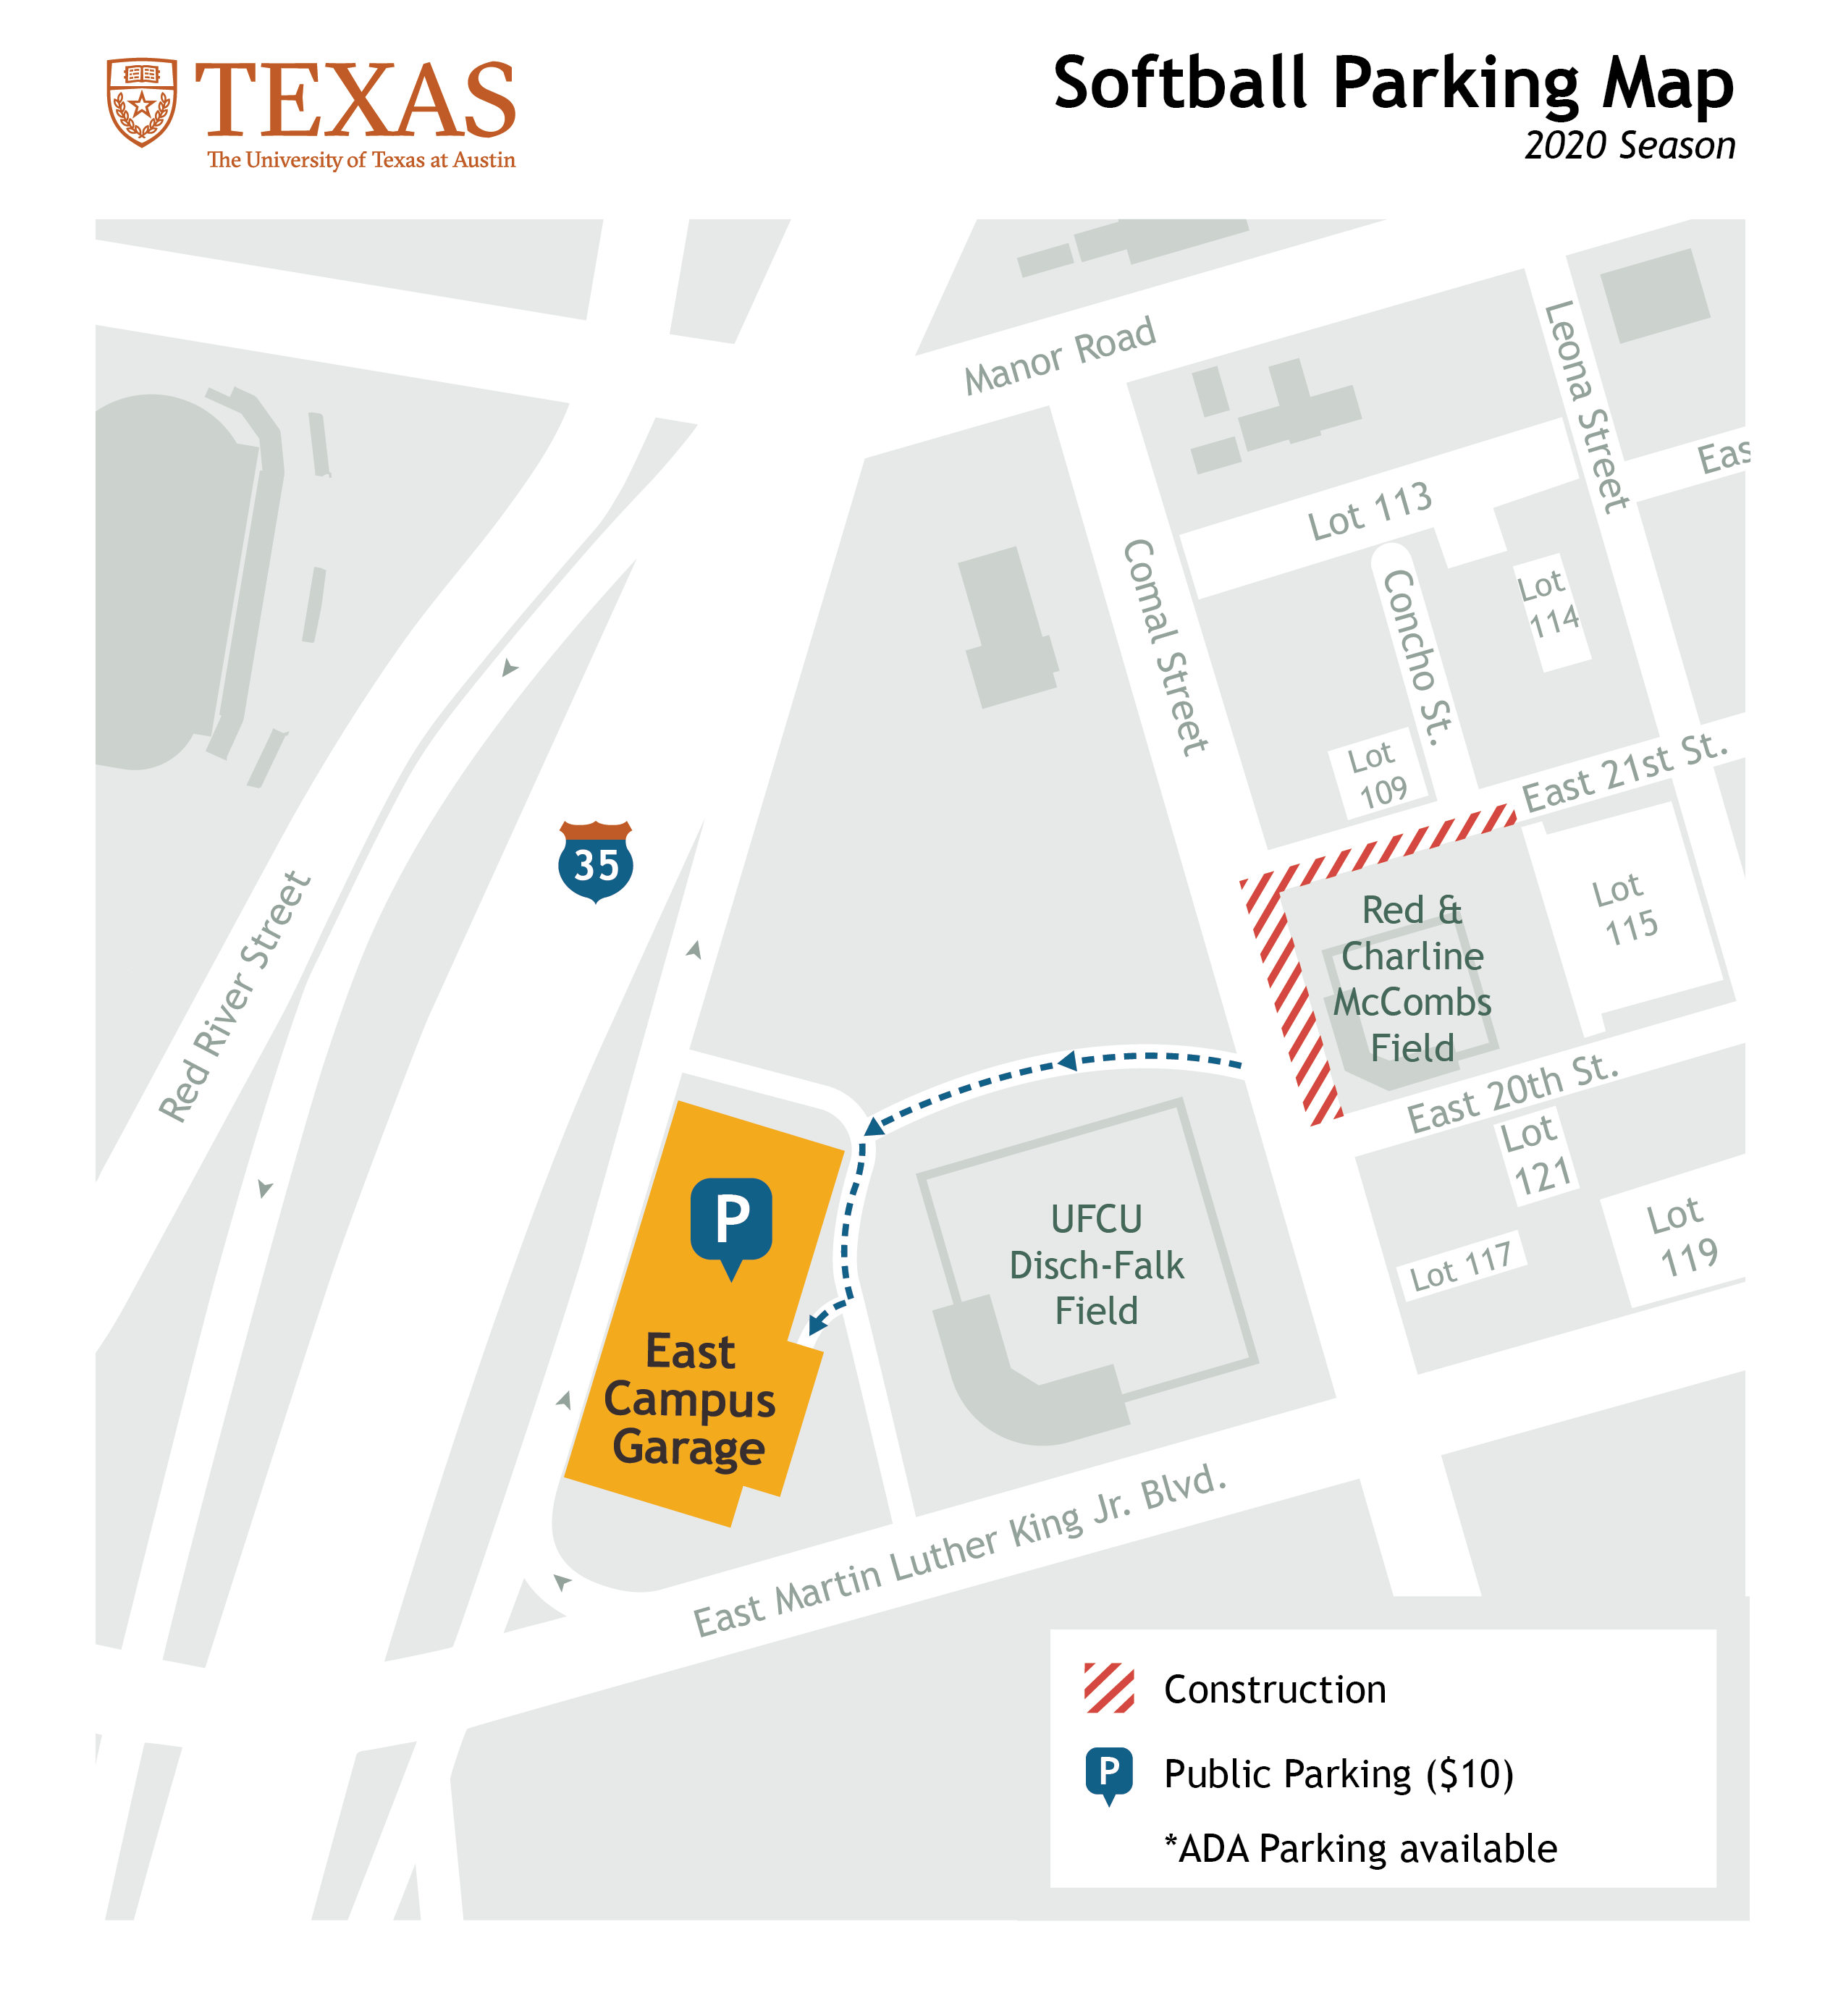 softball parking map 2020